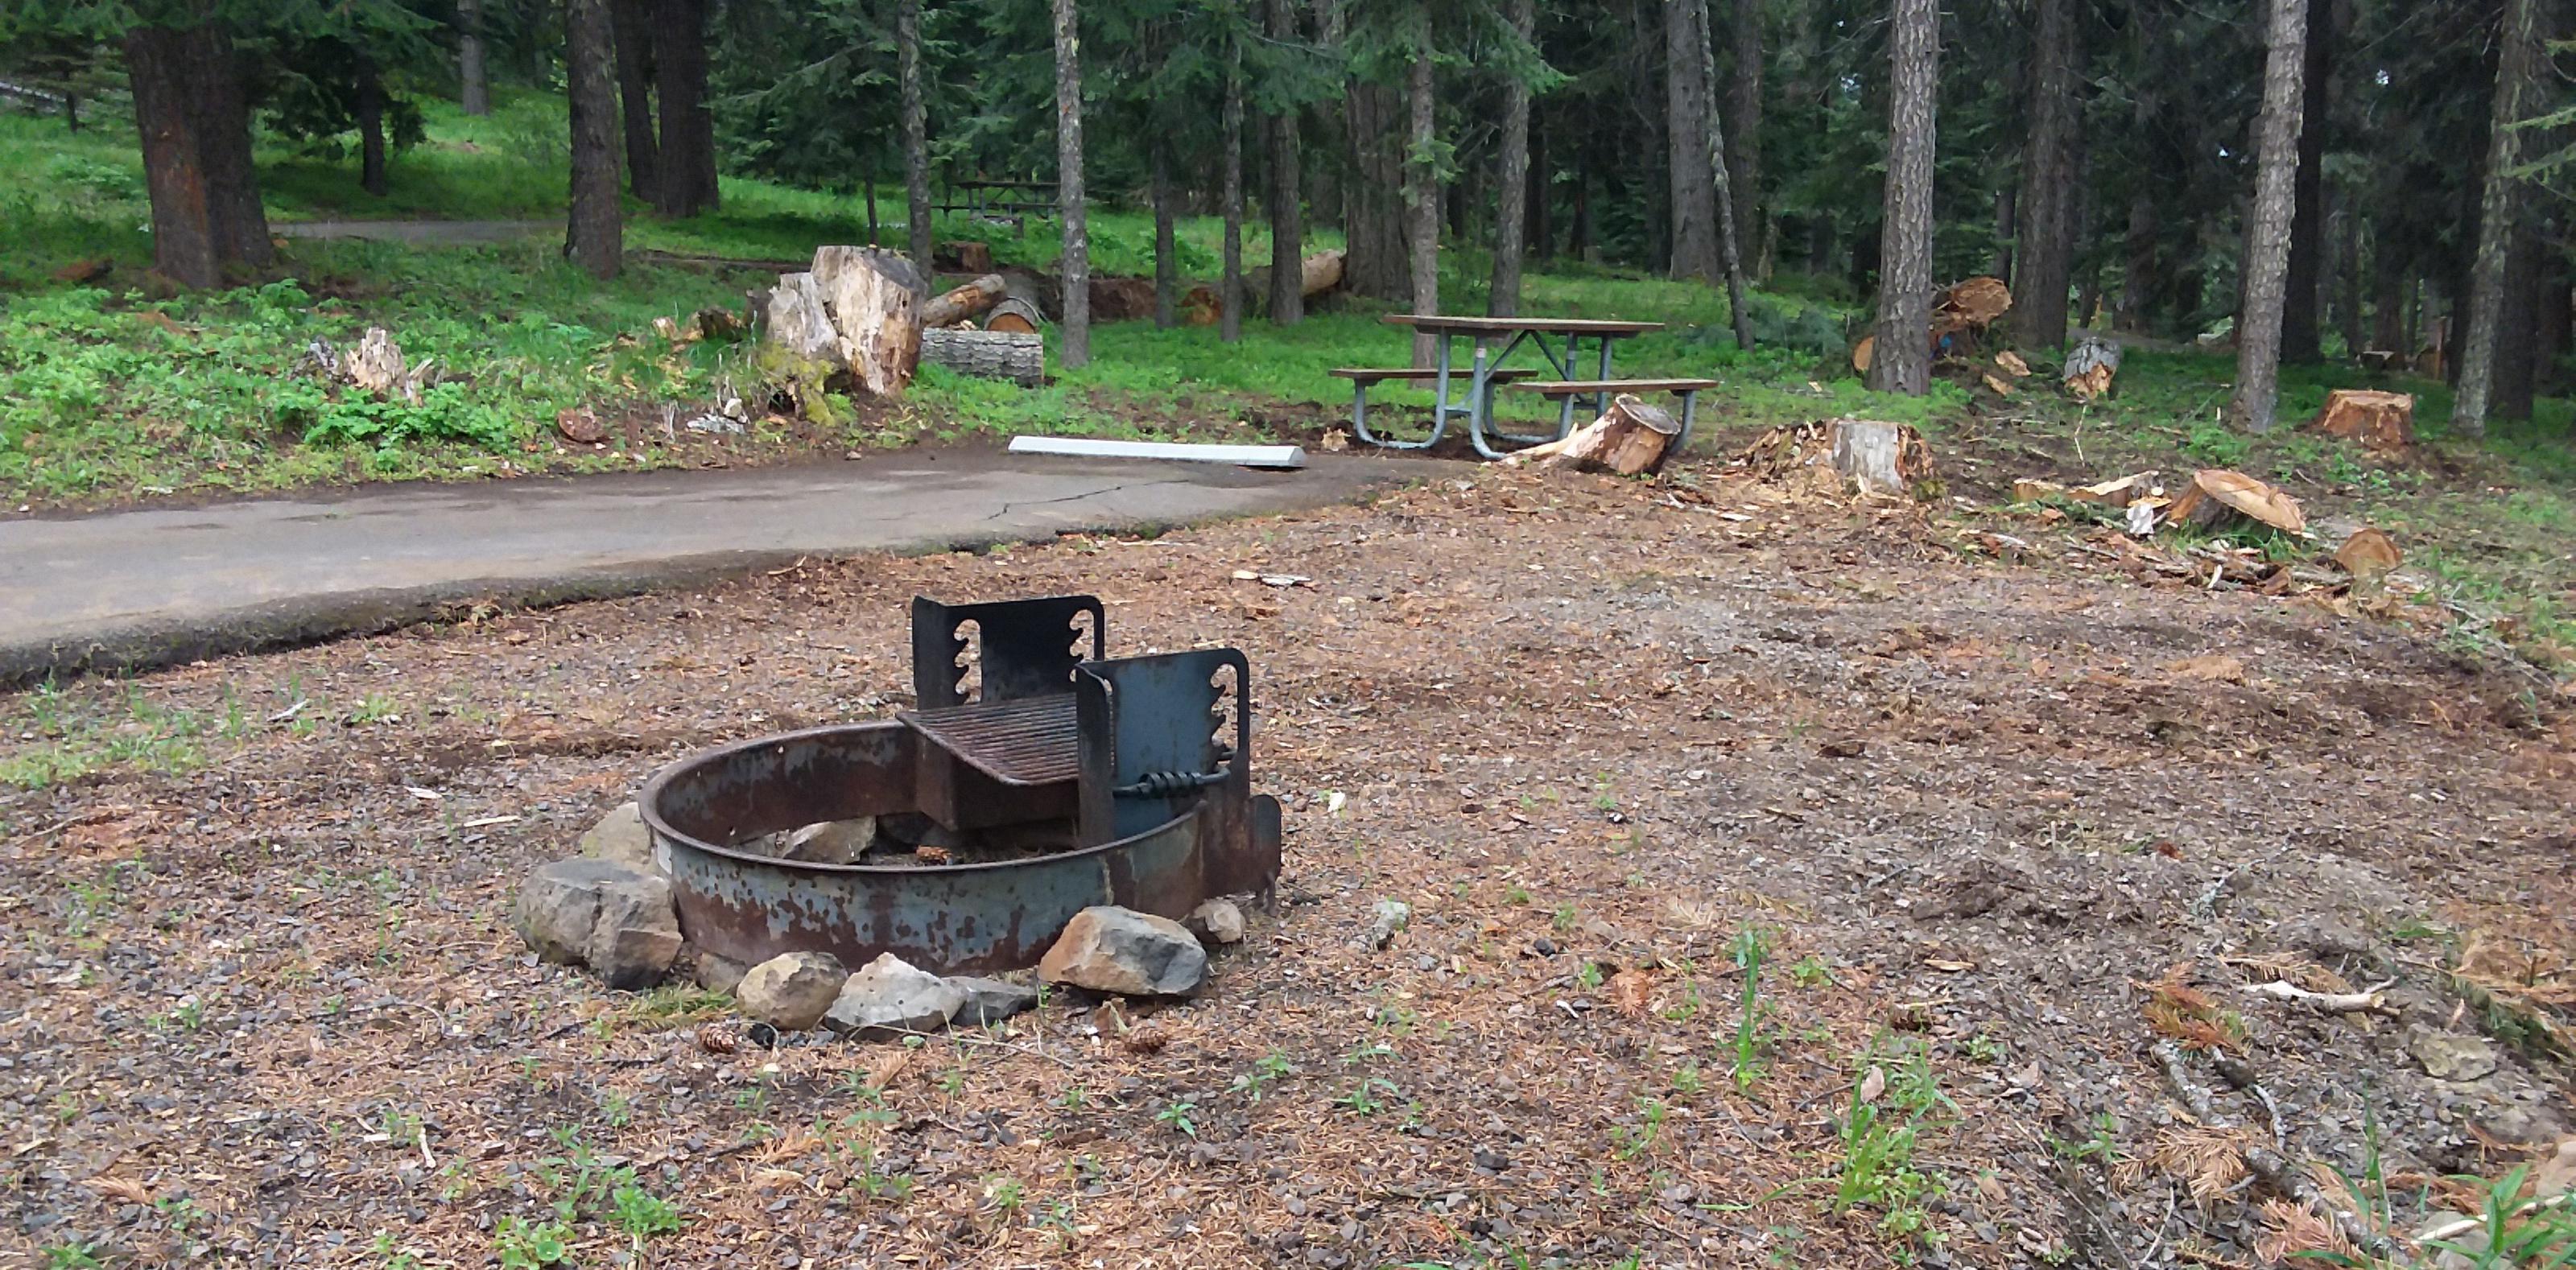 Campsite C35- Hyatt LakeCampsite 35, C Loop Hyatt Lake